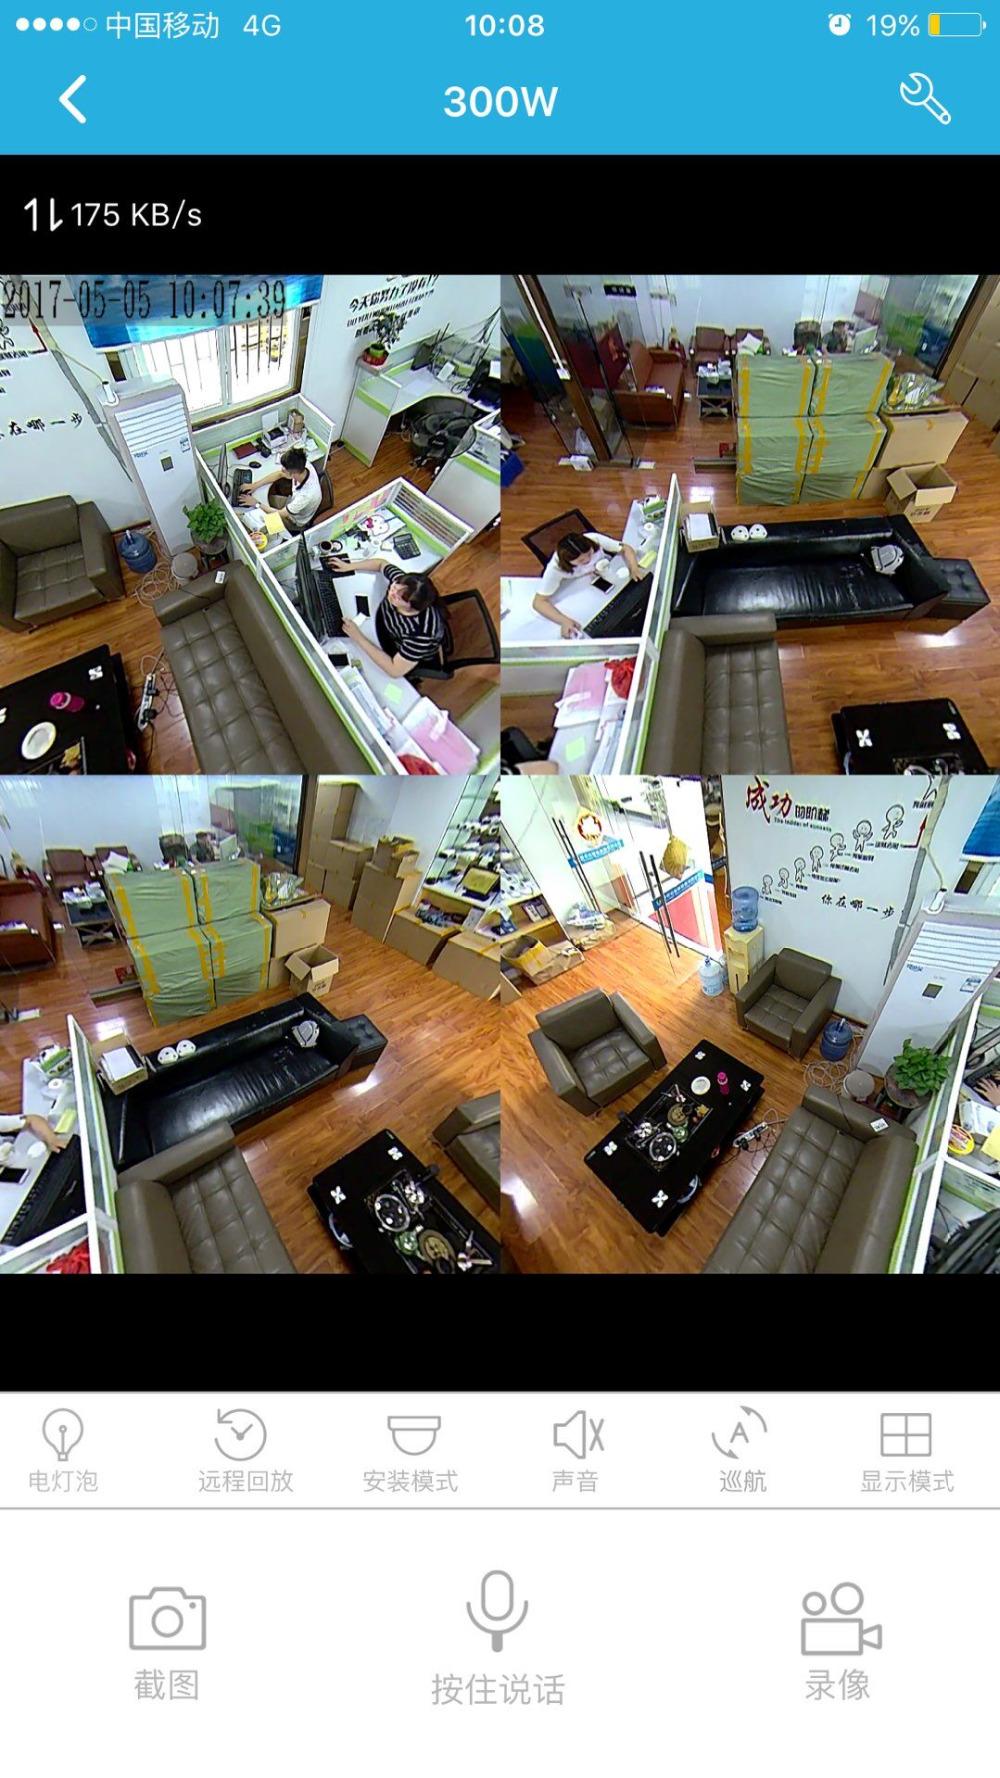 360 IP camera 4 screens